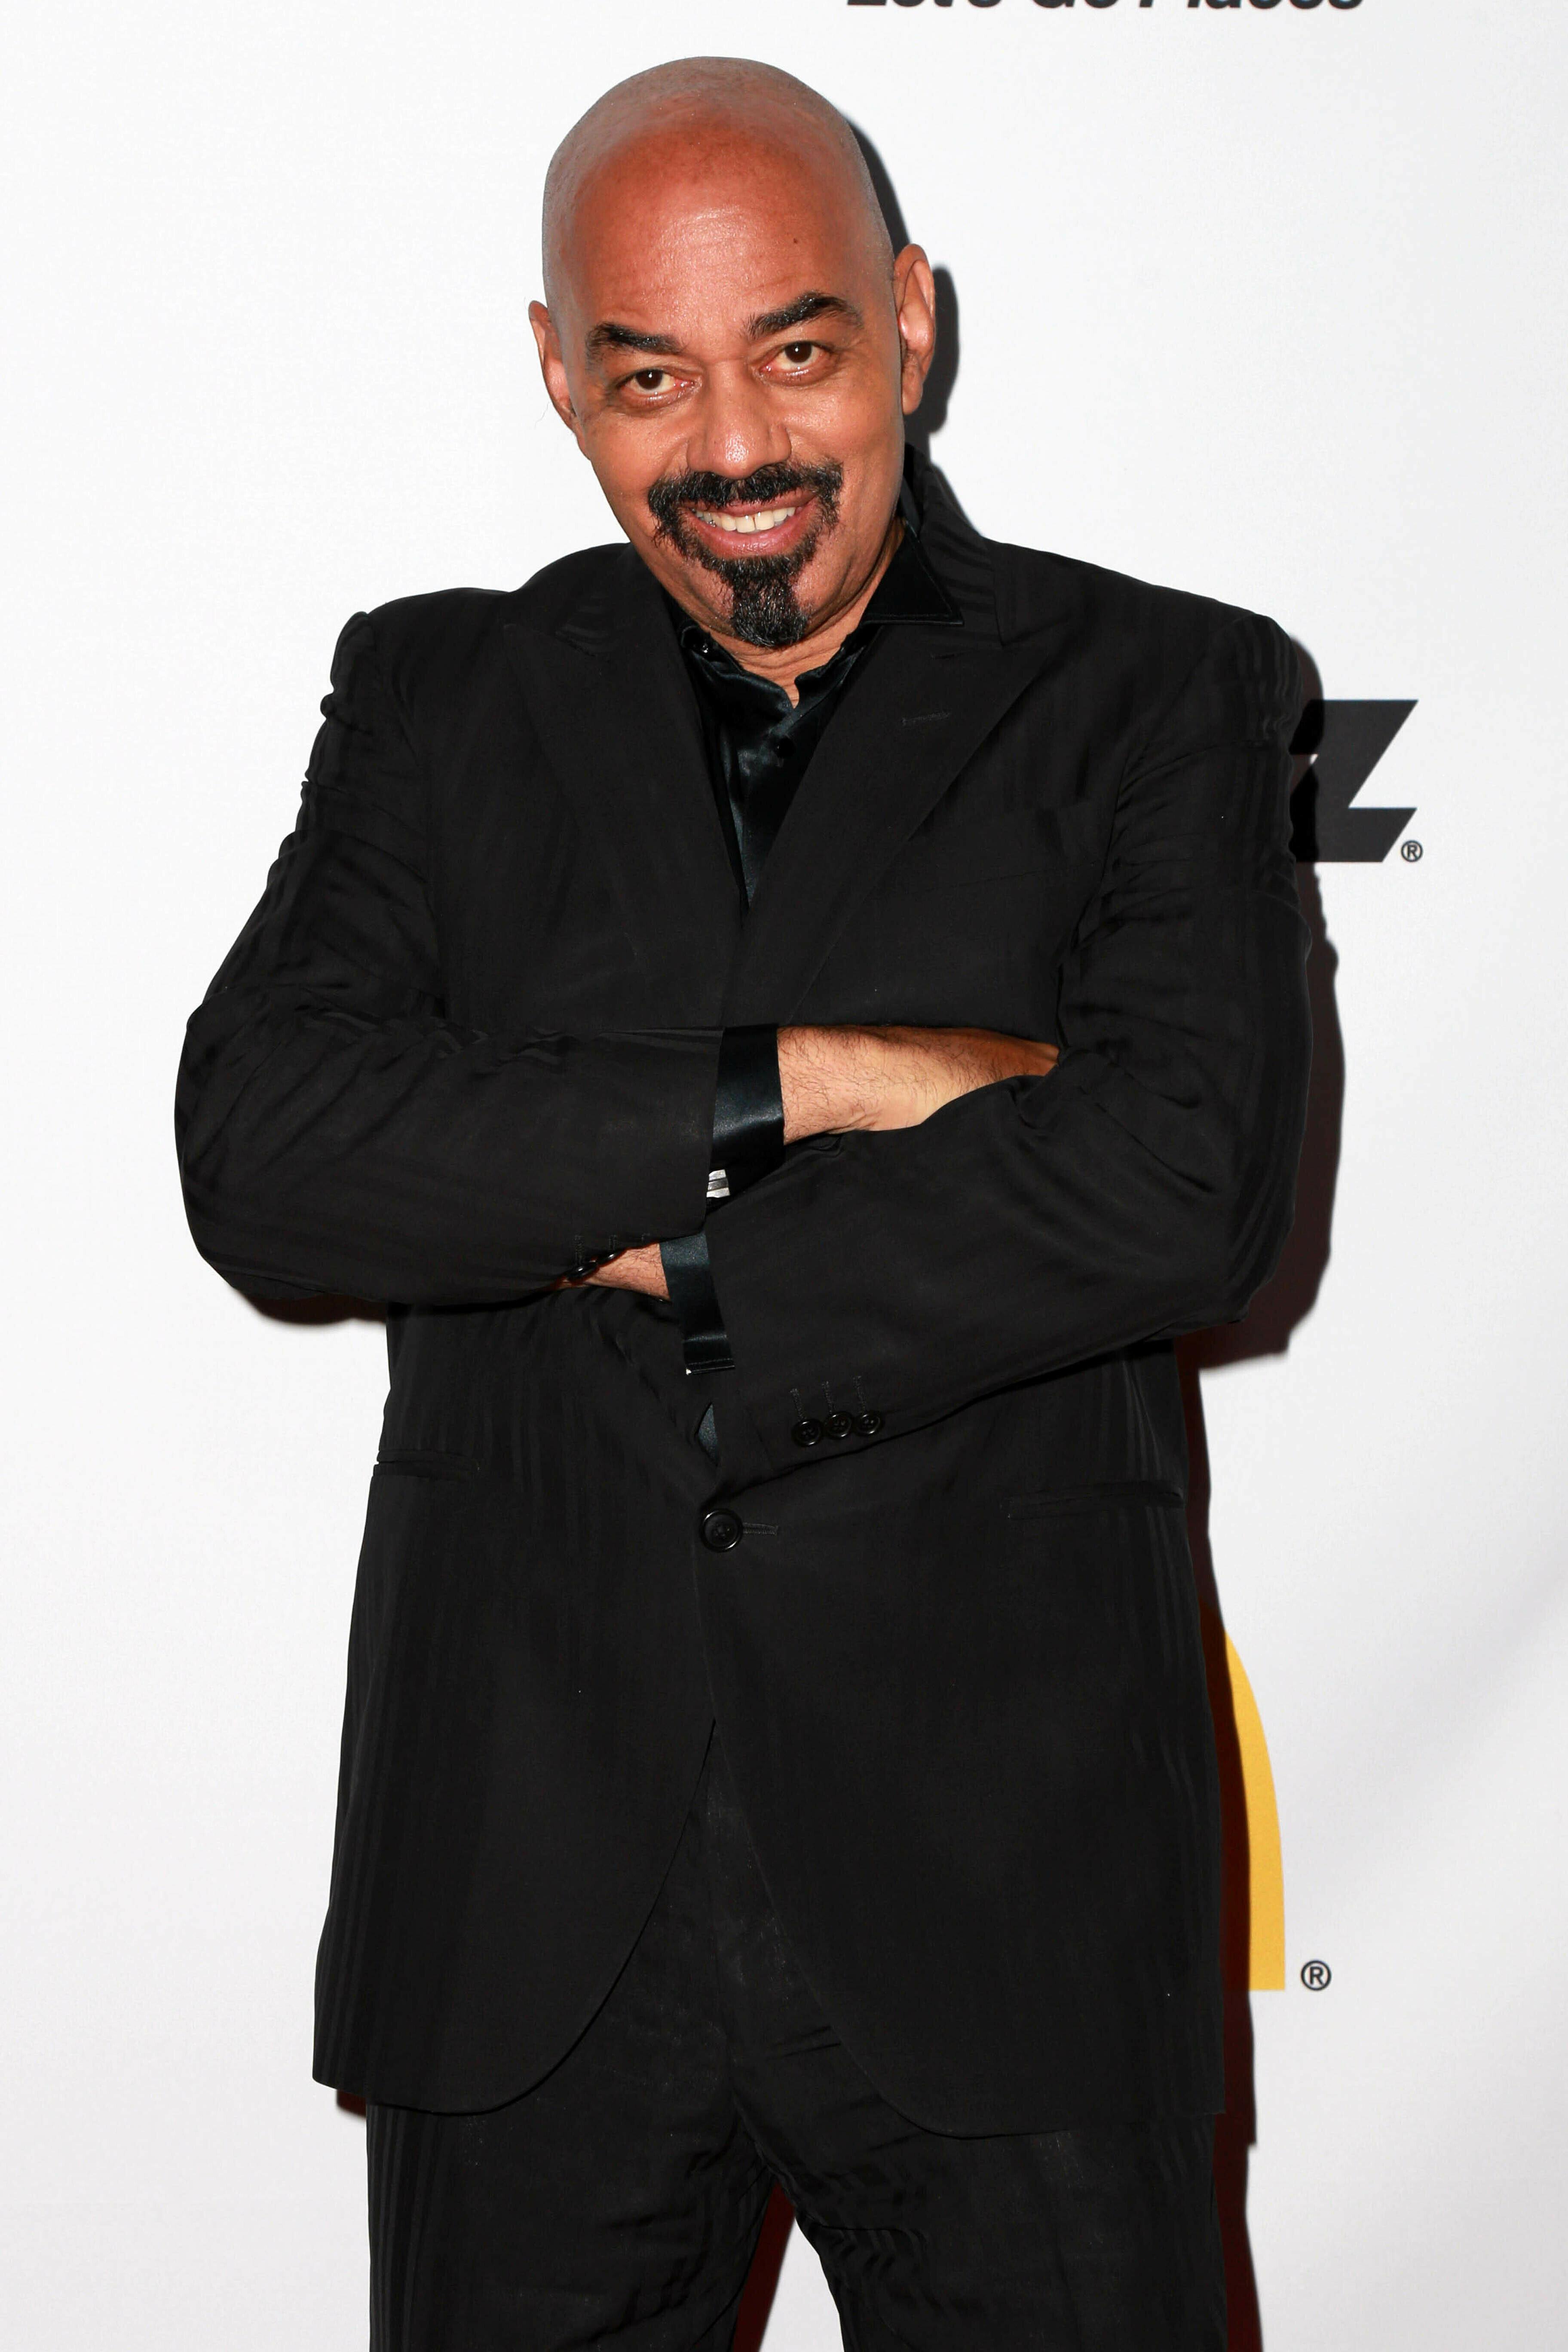 ***FILE PHOTO*** James Ingram has passed Away At Age 66 Of Brain Cancer HOLLYWOOD, CA- NOVEMBER 19: James Ingram at the Ebony Power 100 Gala at Avalon in Hollywood, CA on November 19, 2014. Credit: David Edwards/MediaPunch /IPX